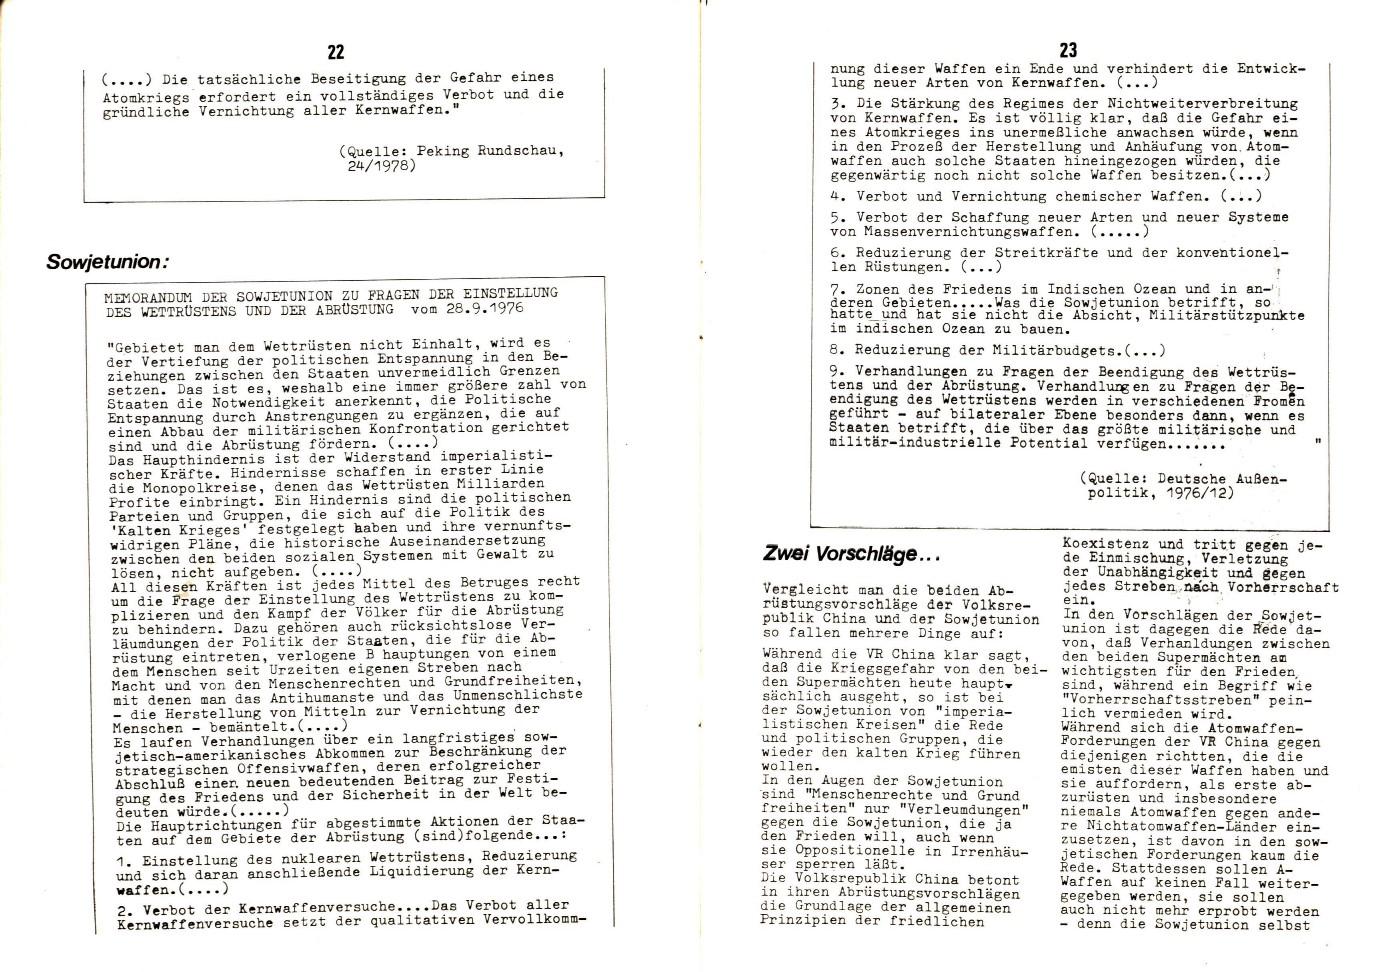 KJVD_1979_Dokumente_zum_Antikriegstag_17